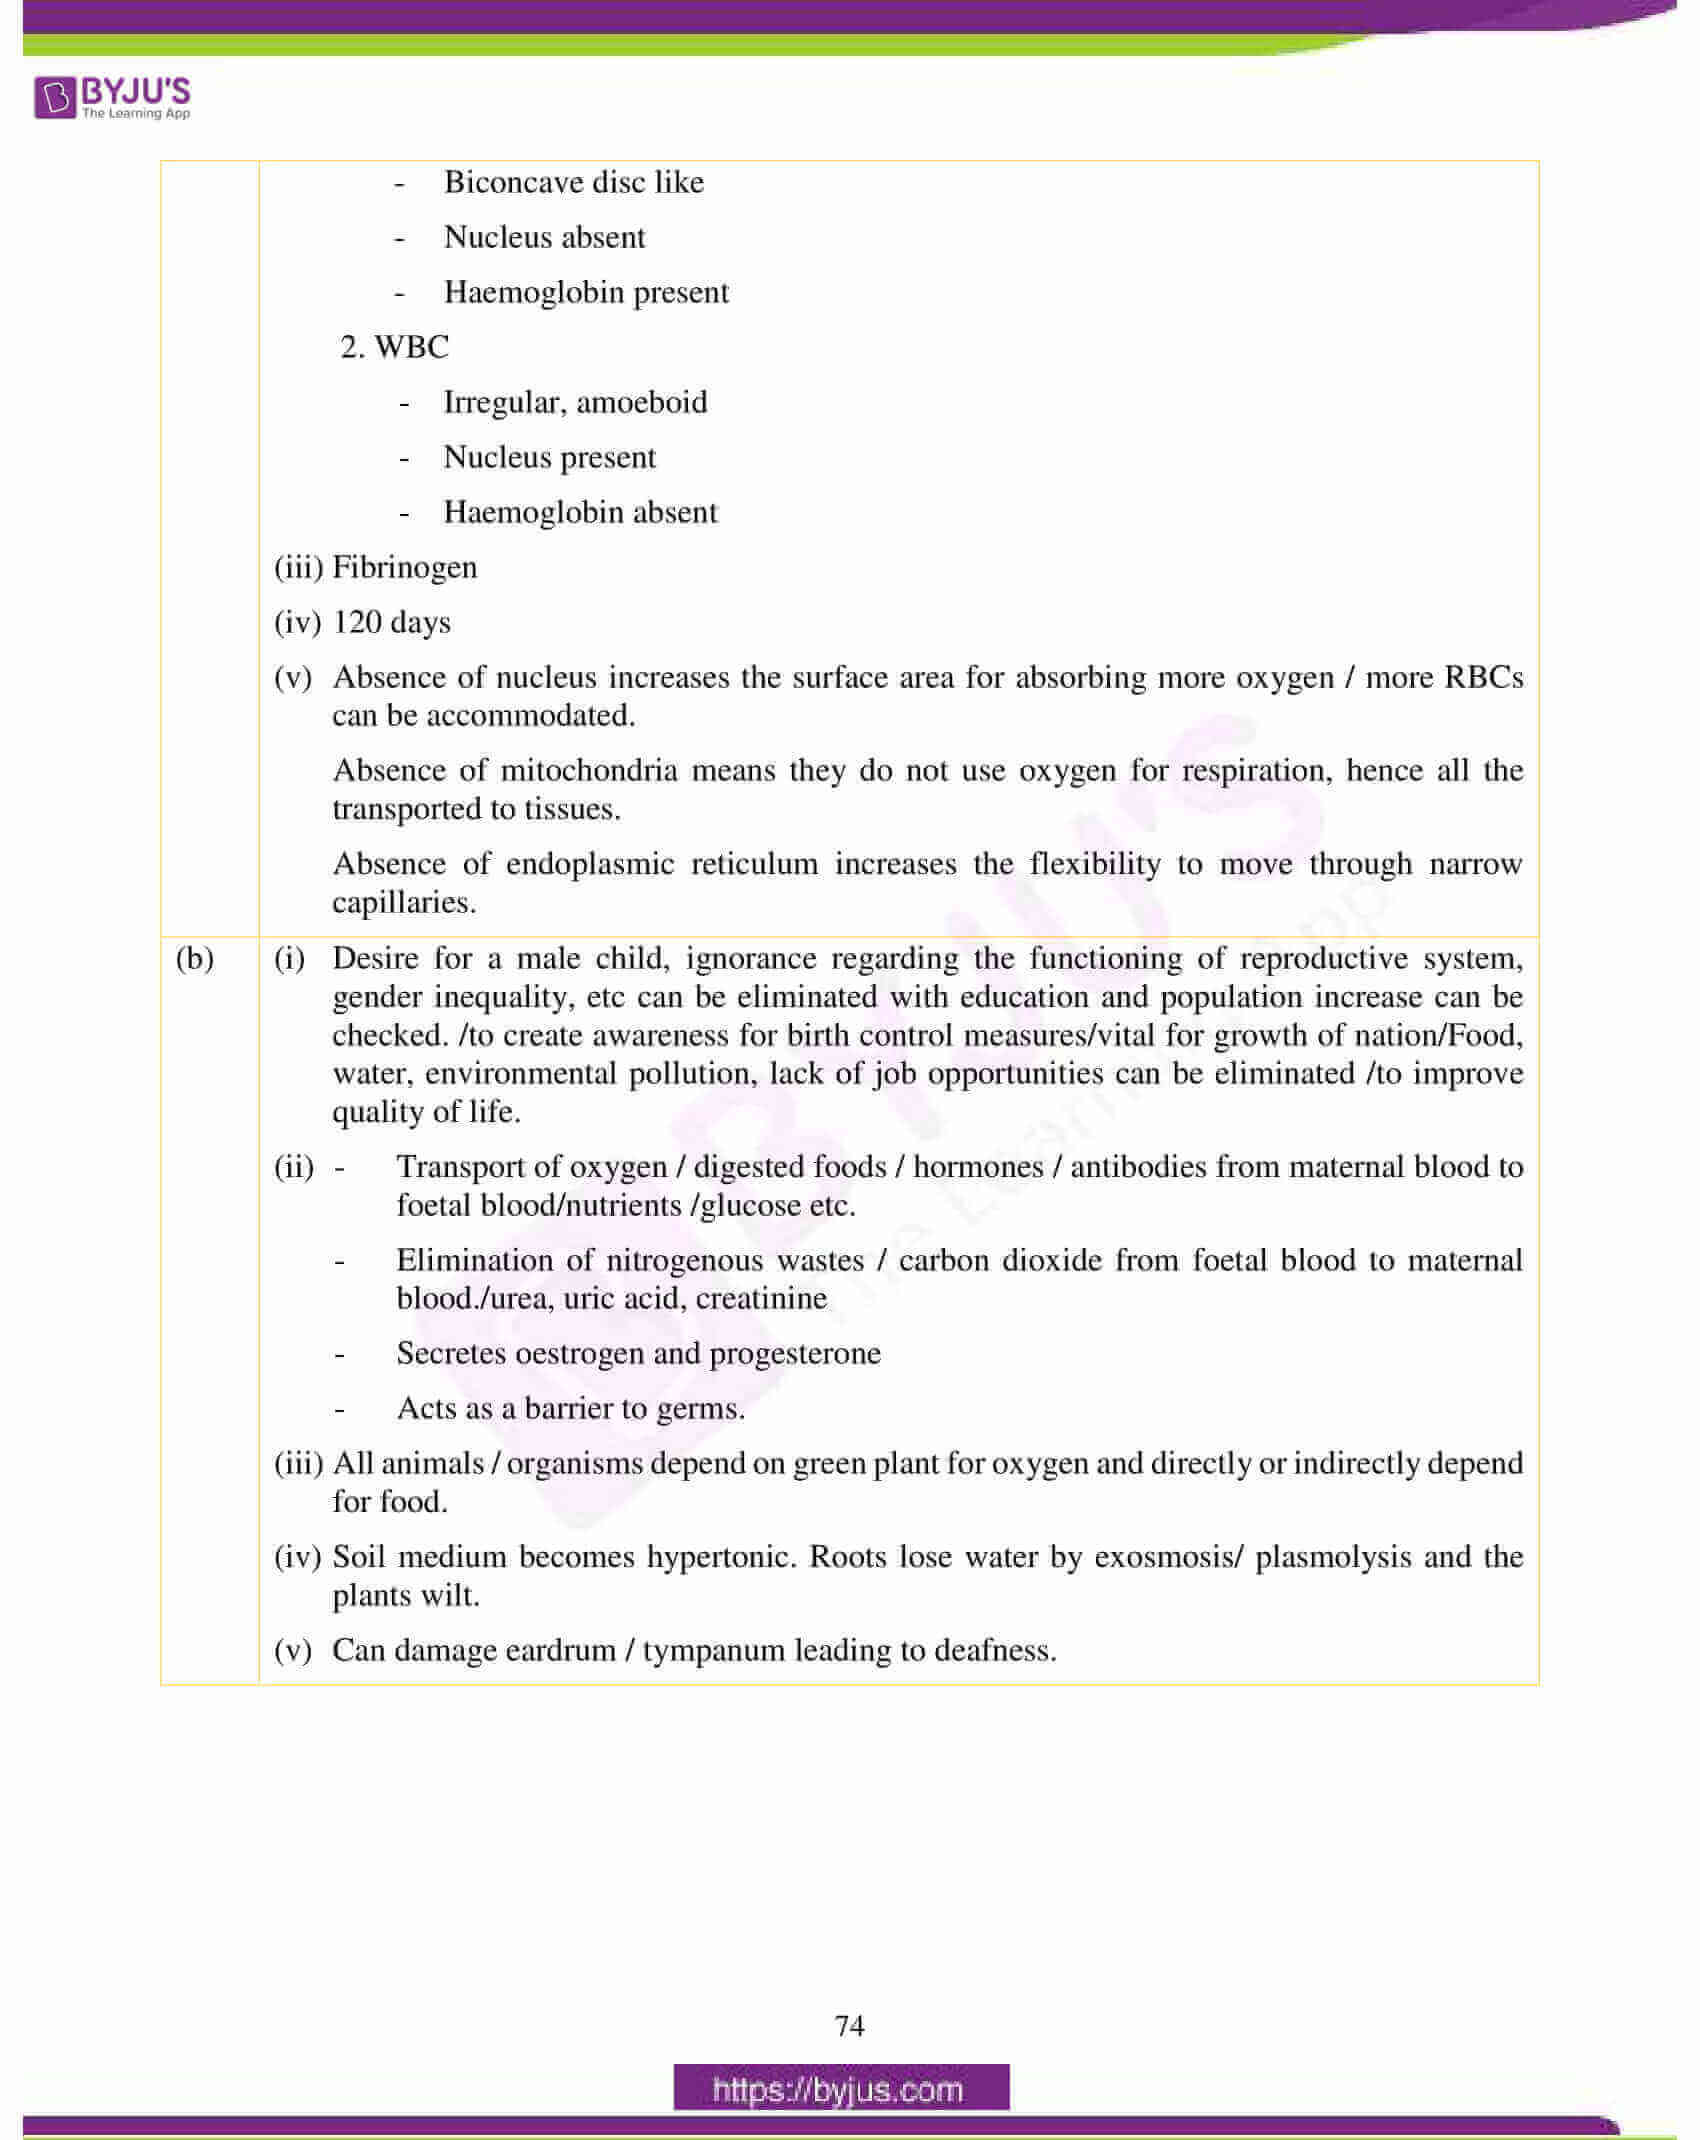 icse class 10 biology question paper solution 2018 21